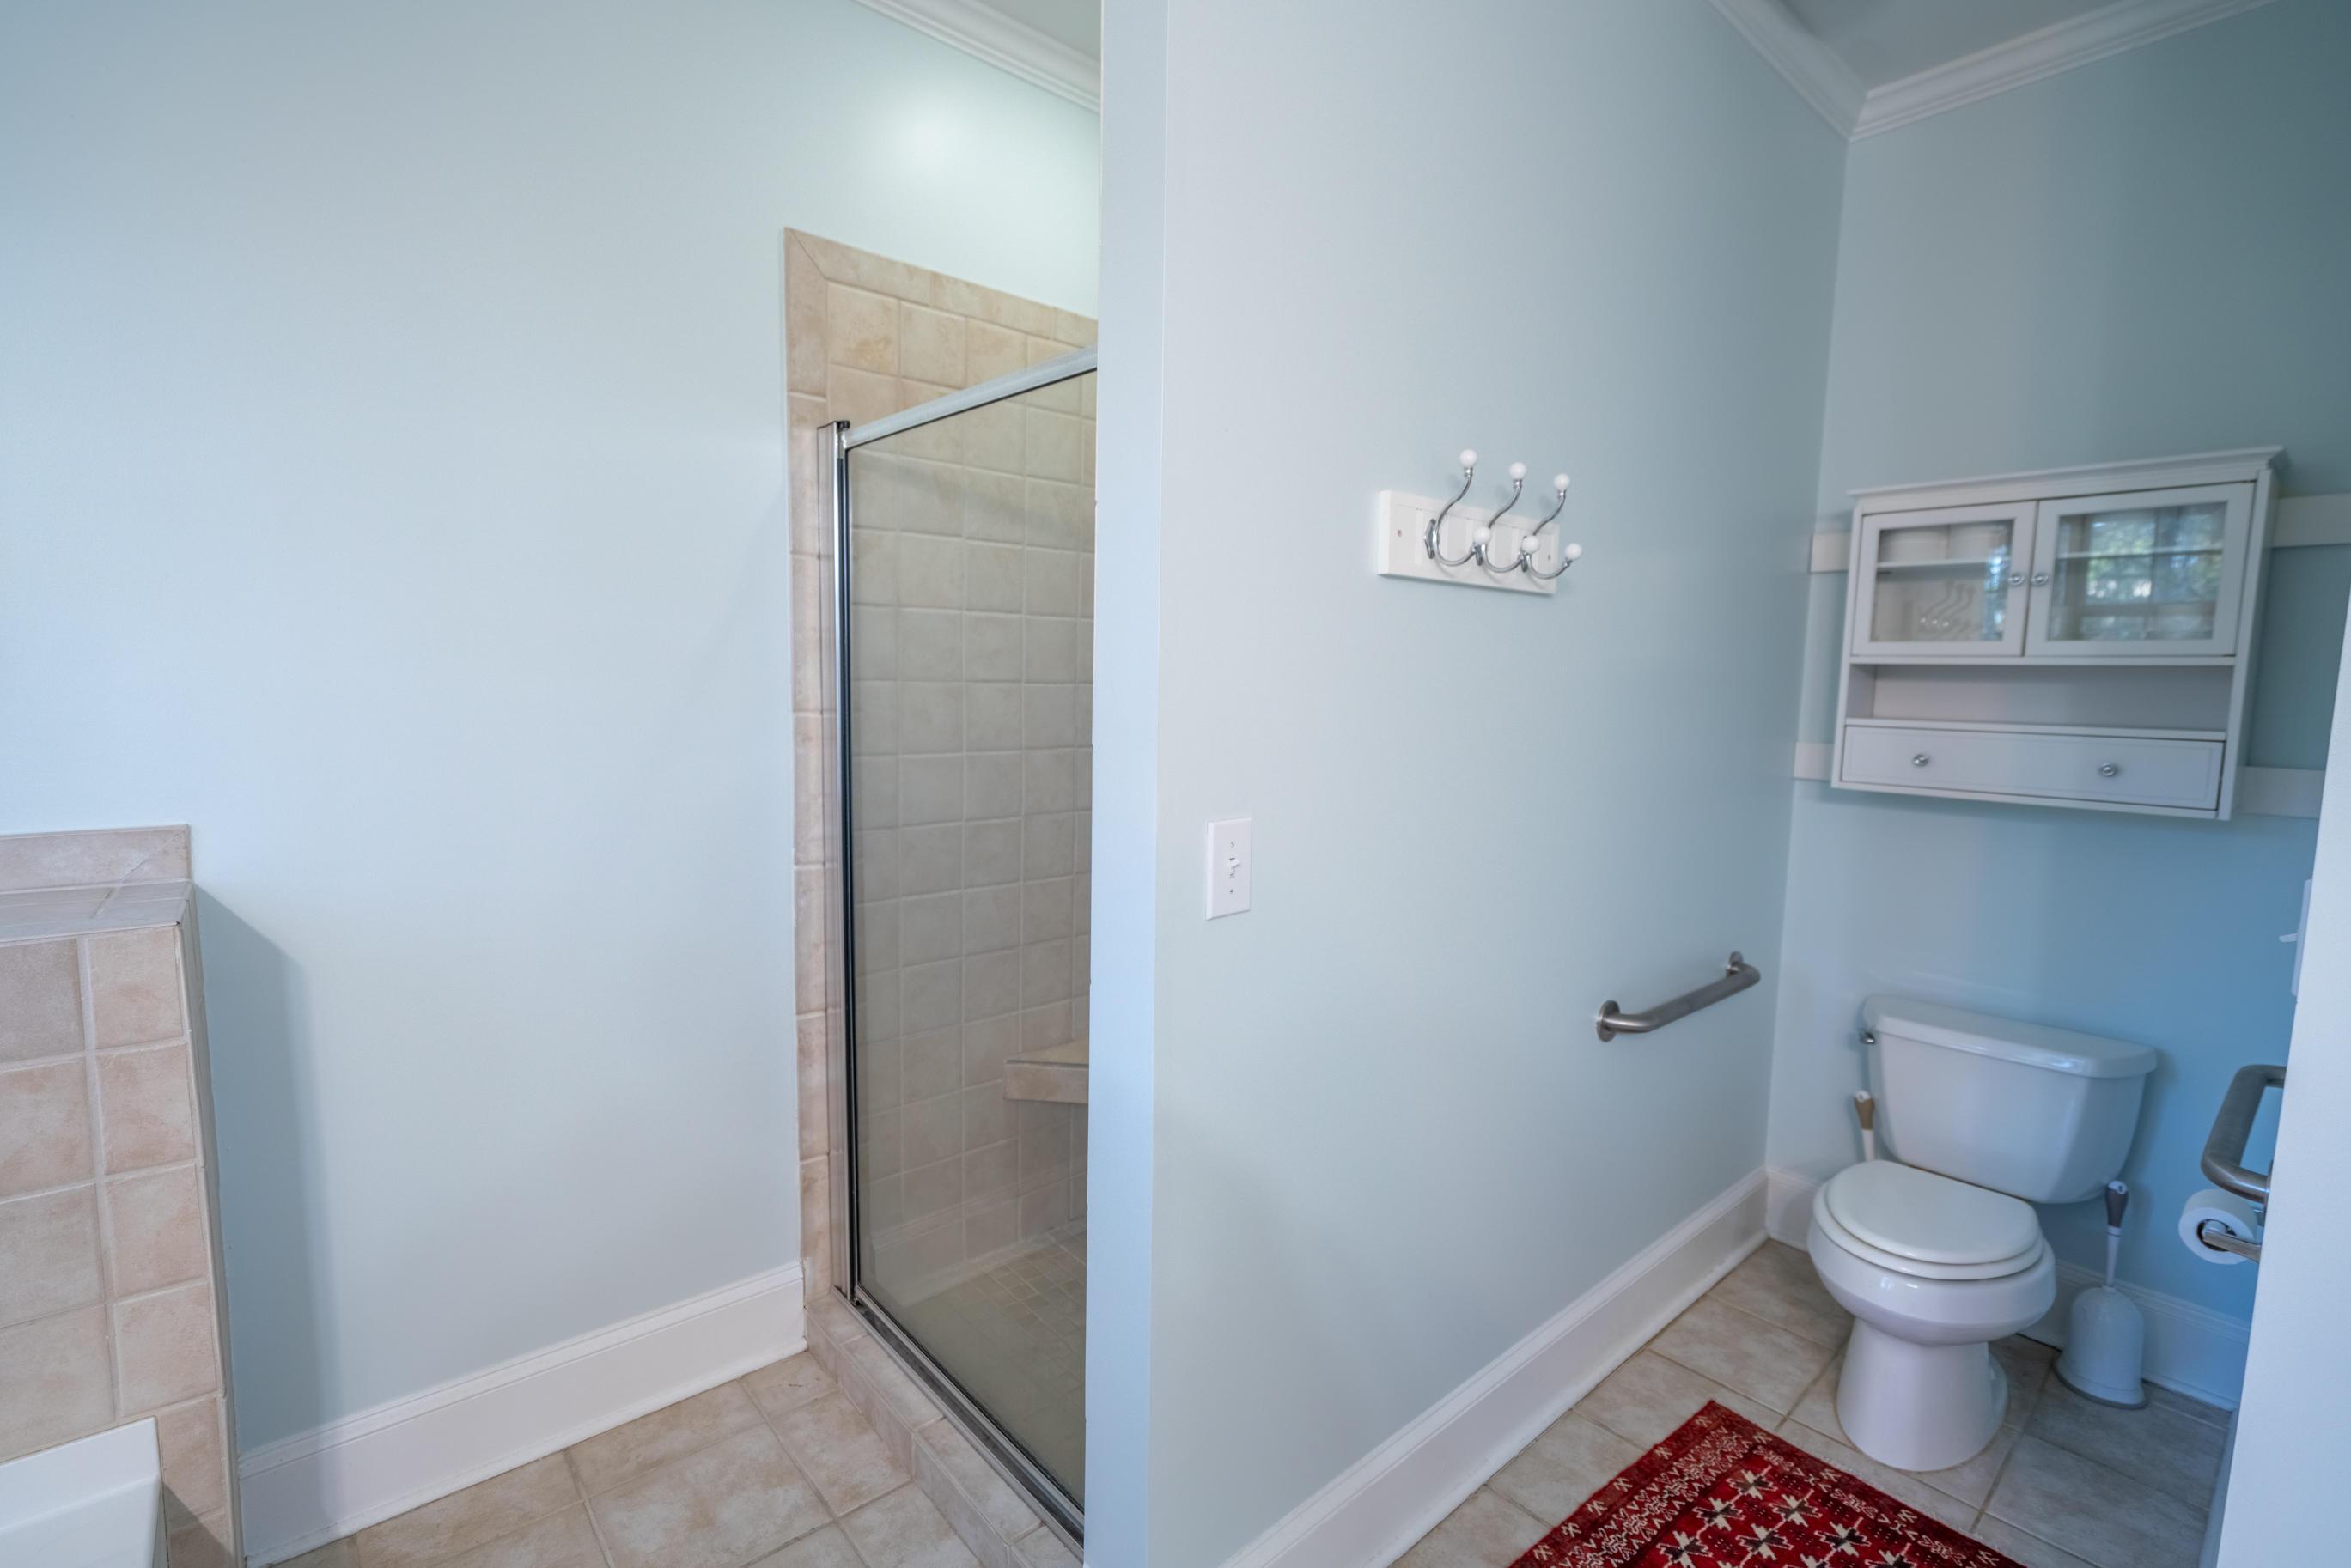 Etiwan Pointe Homes For Sale - 132 Winding Creek, Mount Pleasant, SC - 5